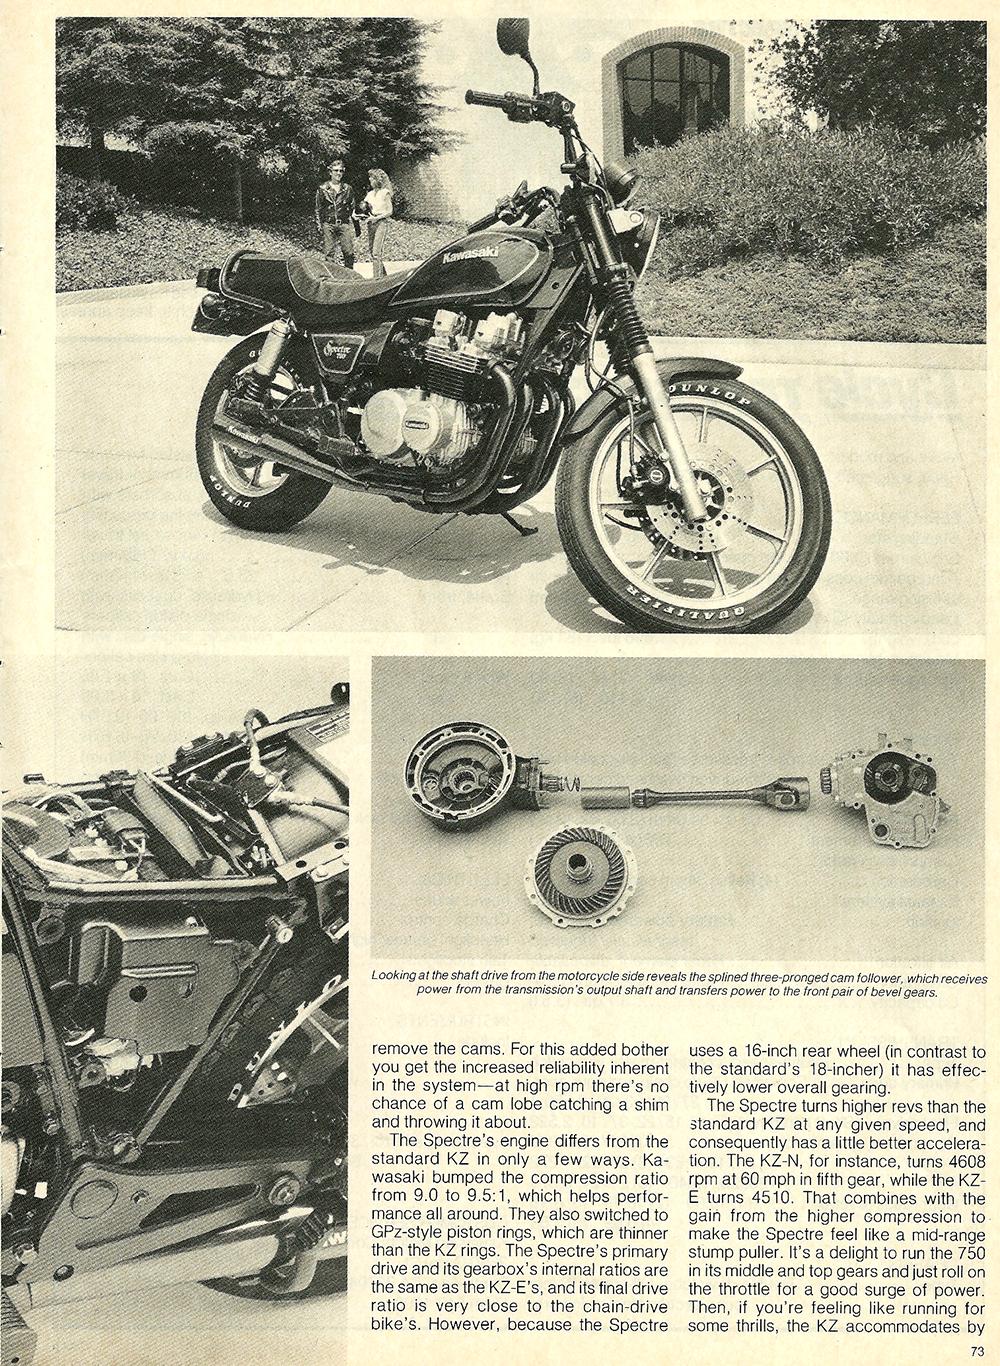 1982 Kawasaki KZ750N Spectre road test 6.jpg